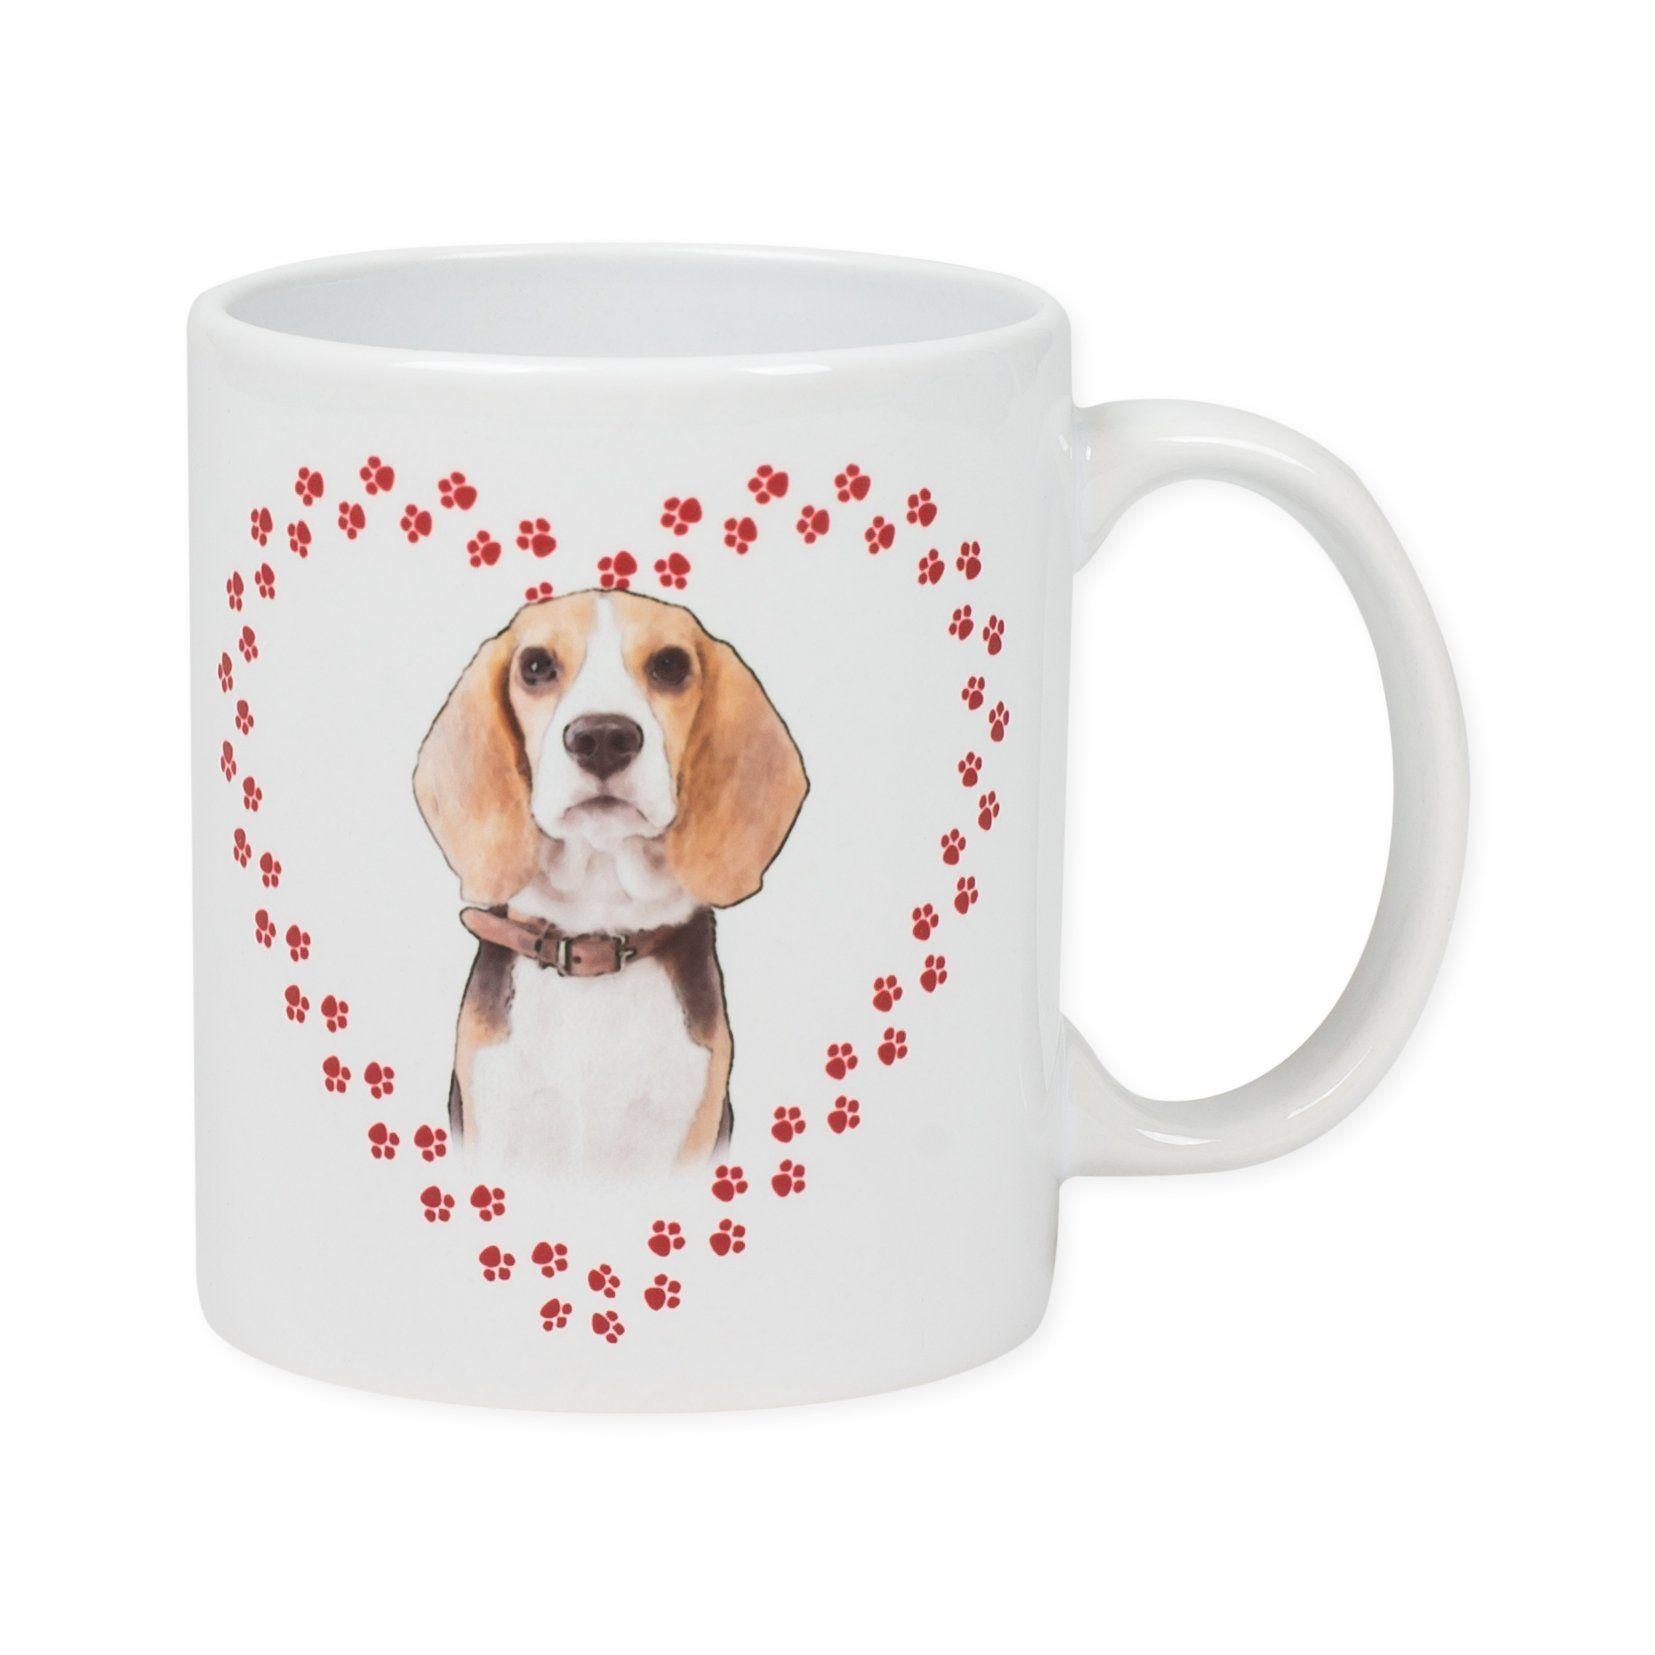 All I Need Is Coffee And My Beagle 11 Ounce Ceramic Coffee Mug